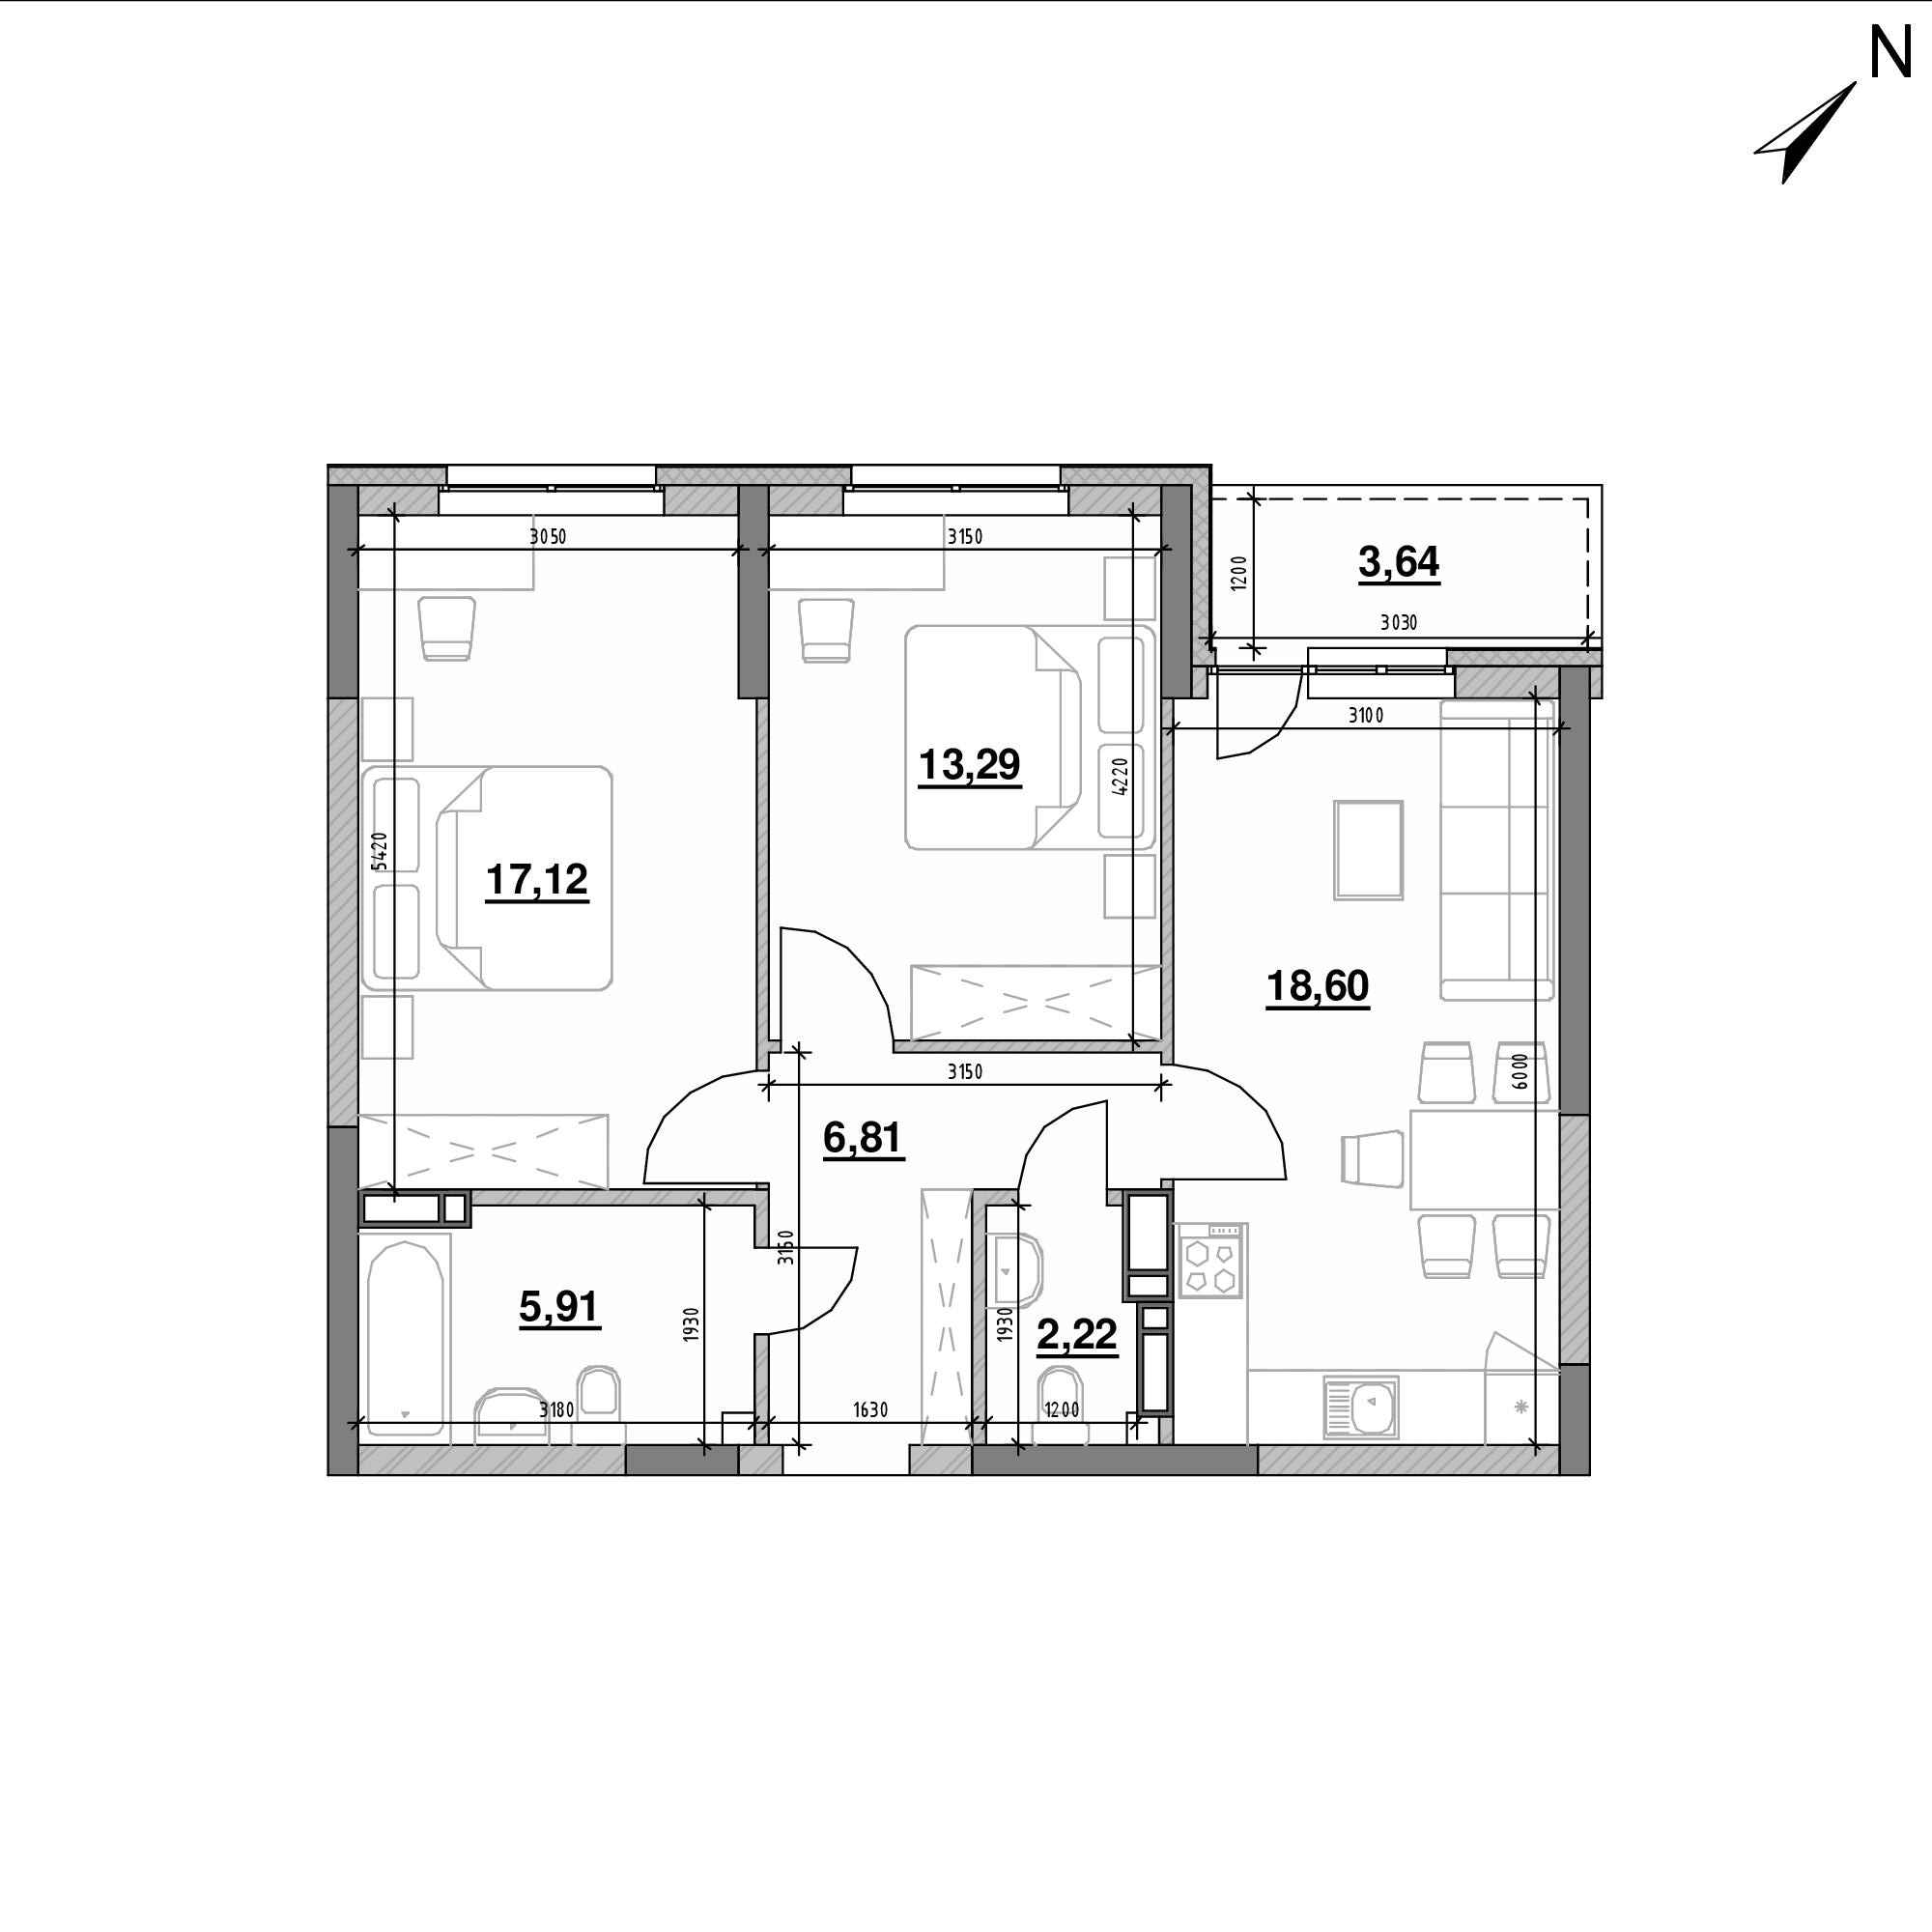 ЖК Оk'Land: планування 2-кімнатної квартири, №452, 67.59 м<sup>2</sup>